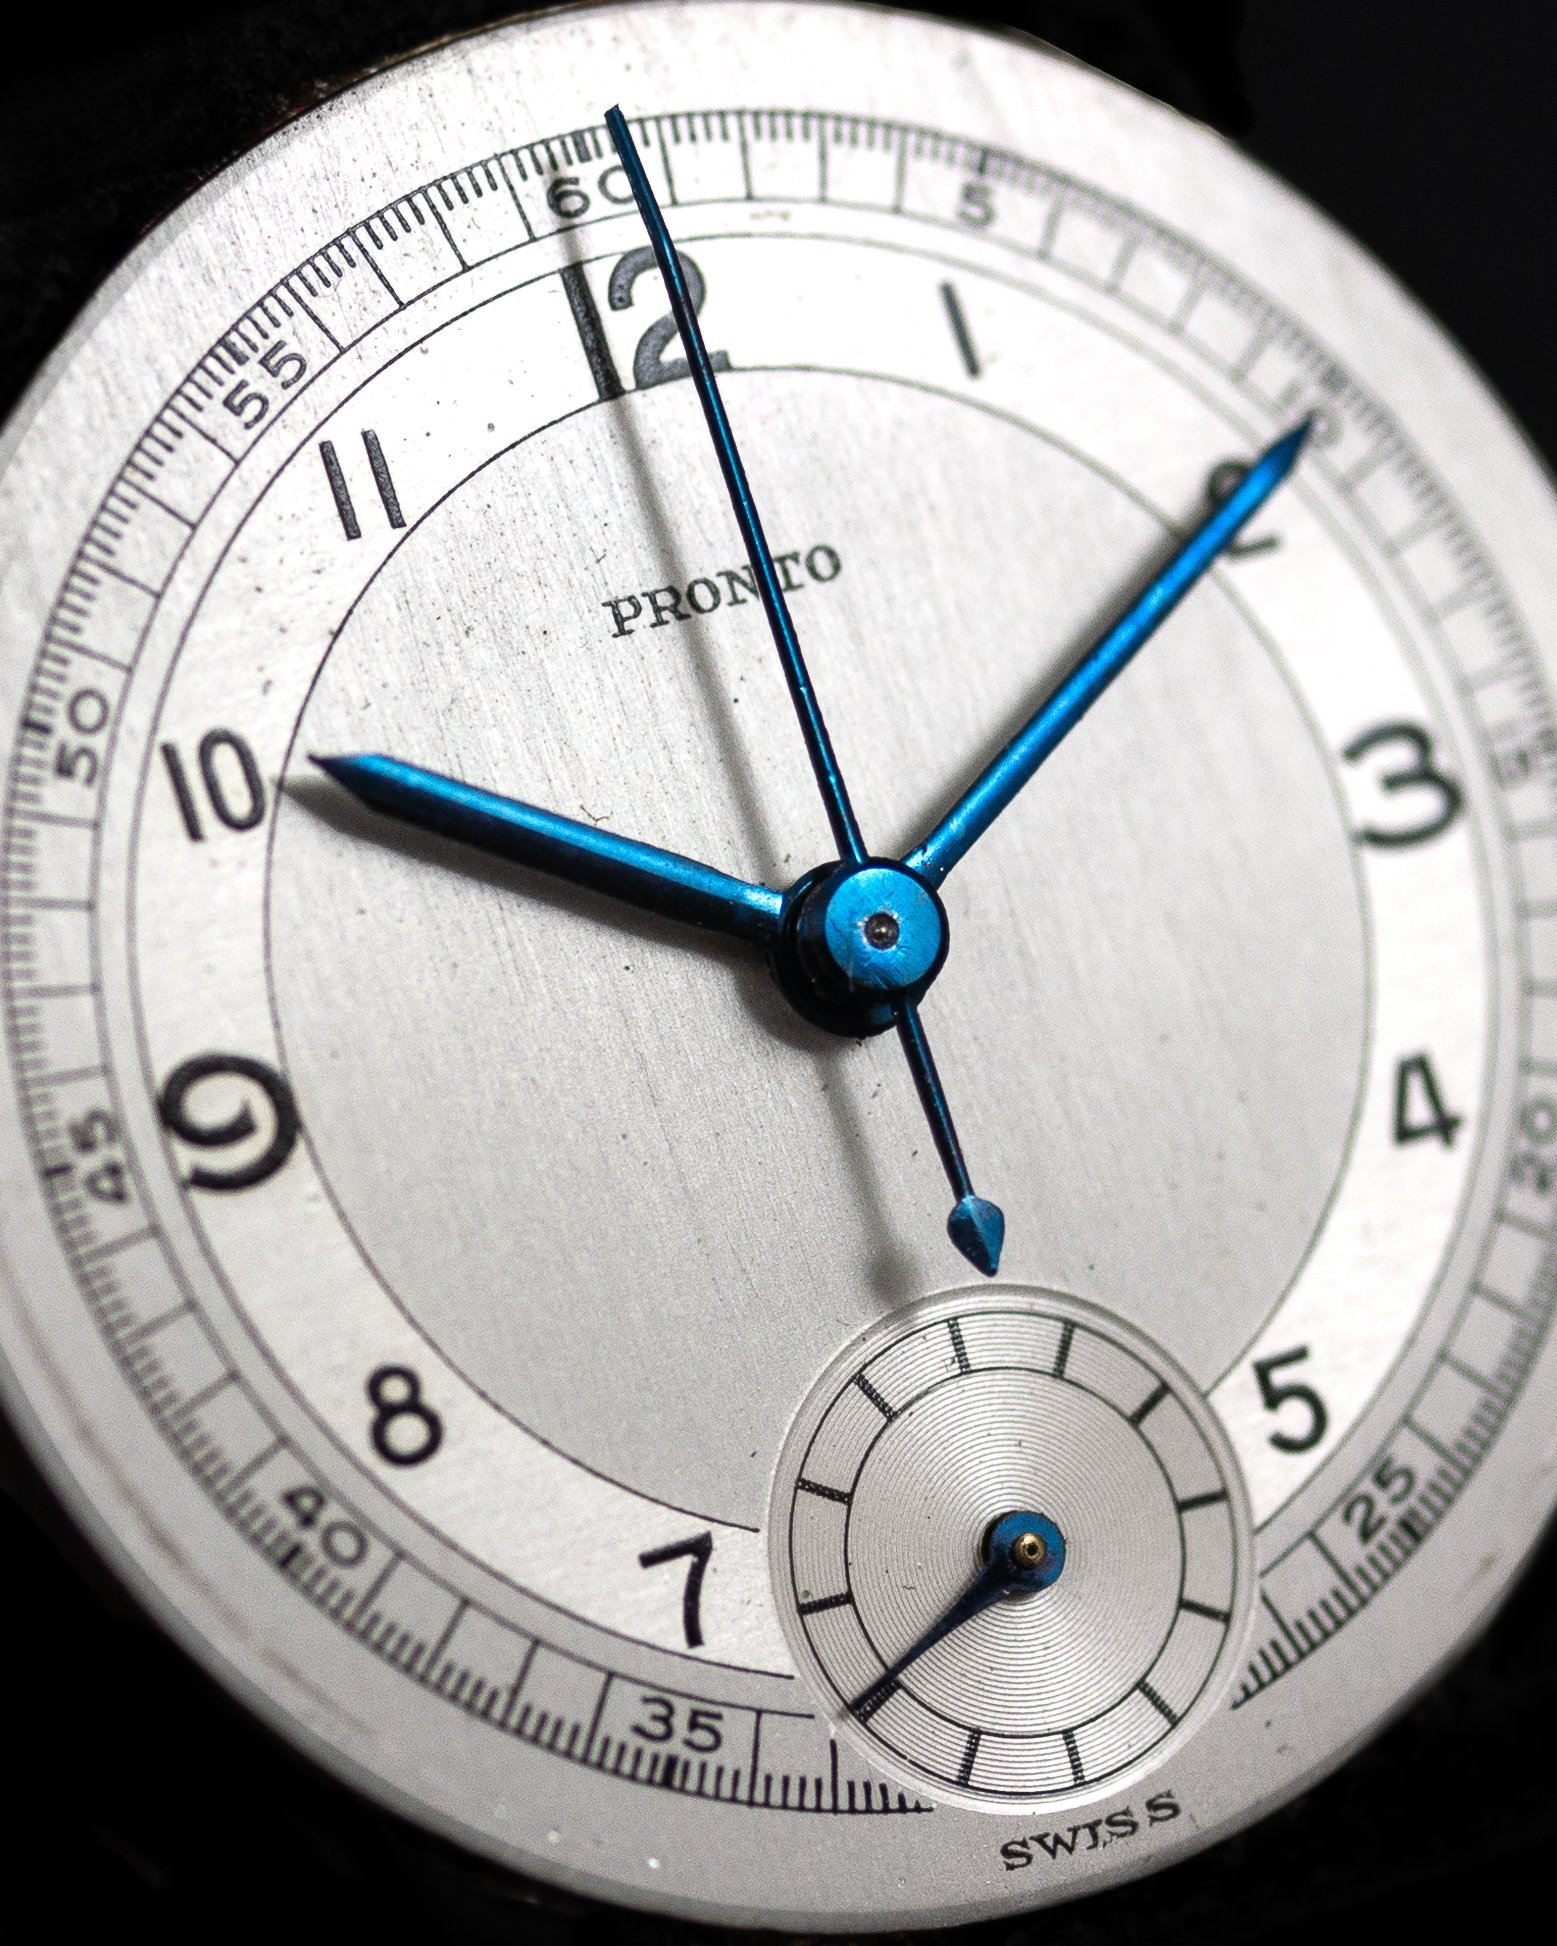 Pronto Verdal Monopusher Venus 131 NOS Sector dial Rotatable bezel